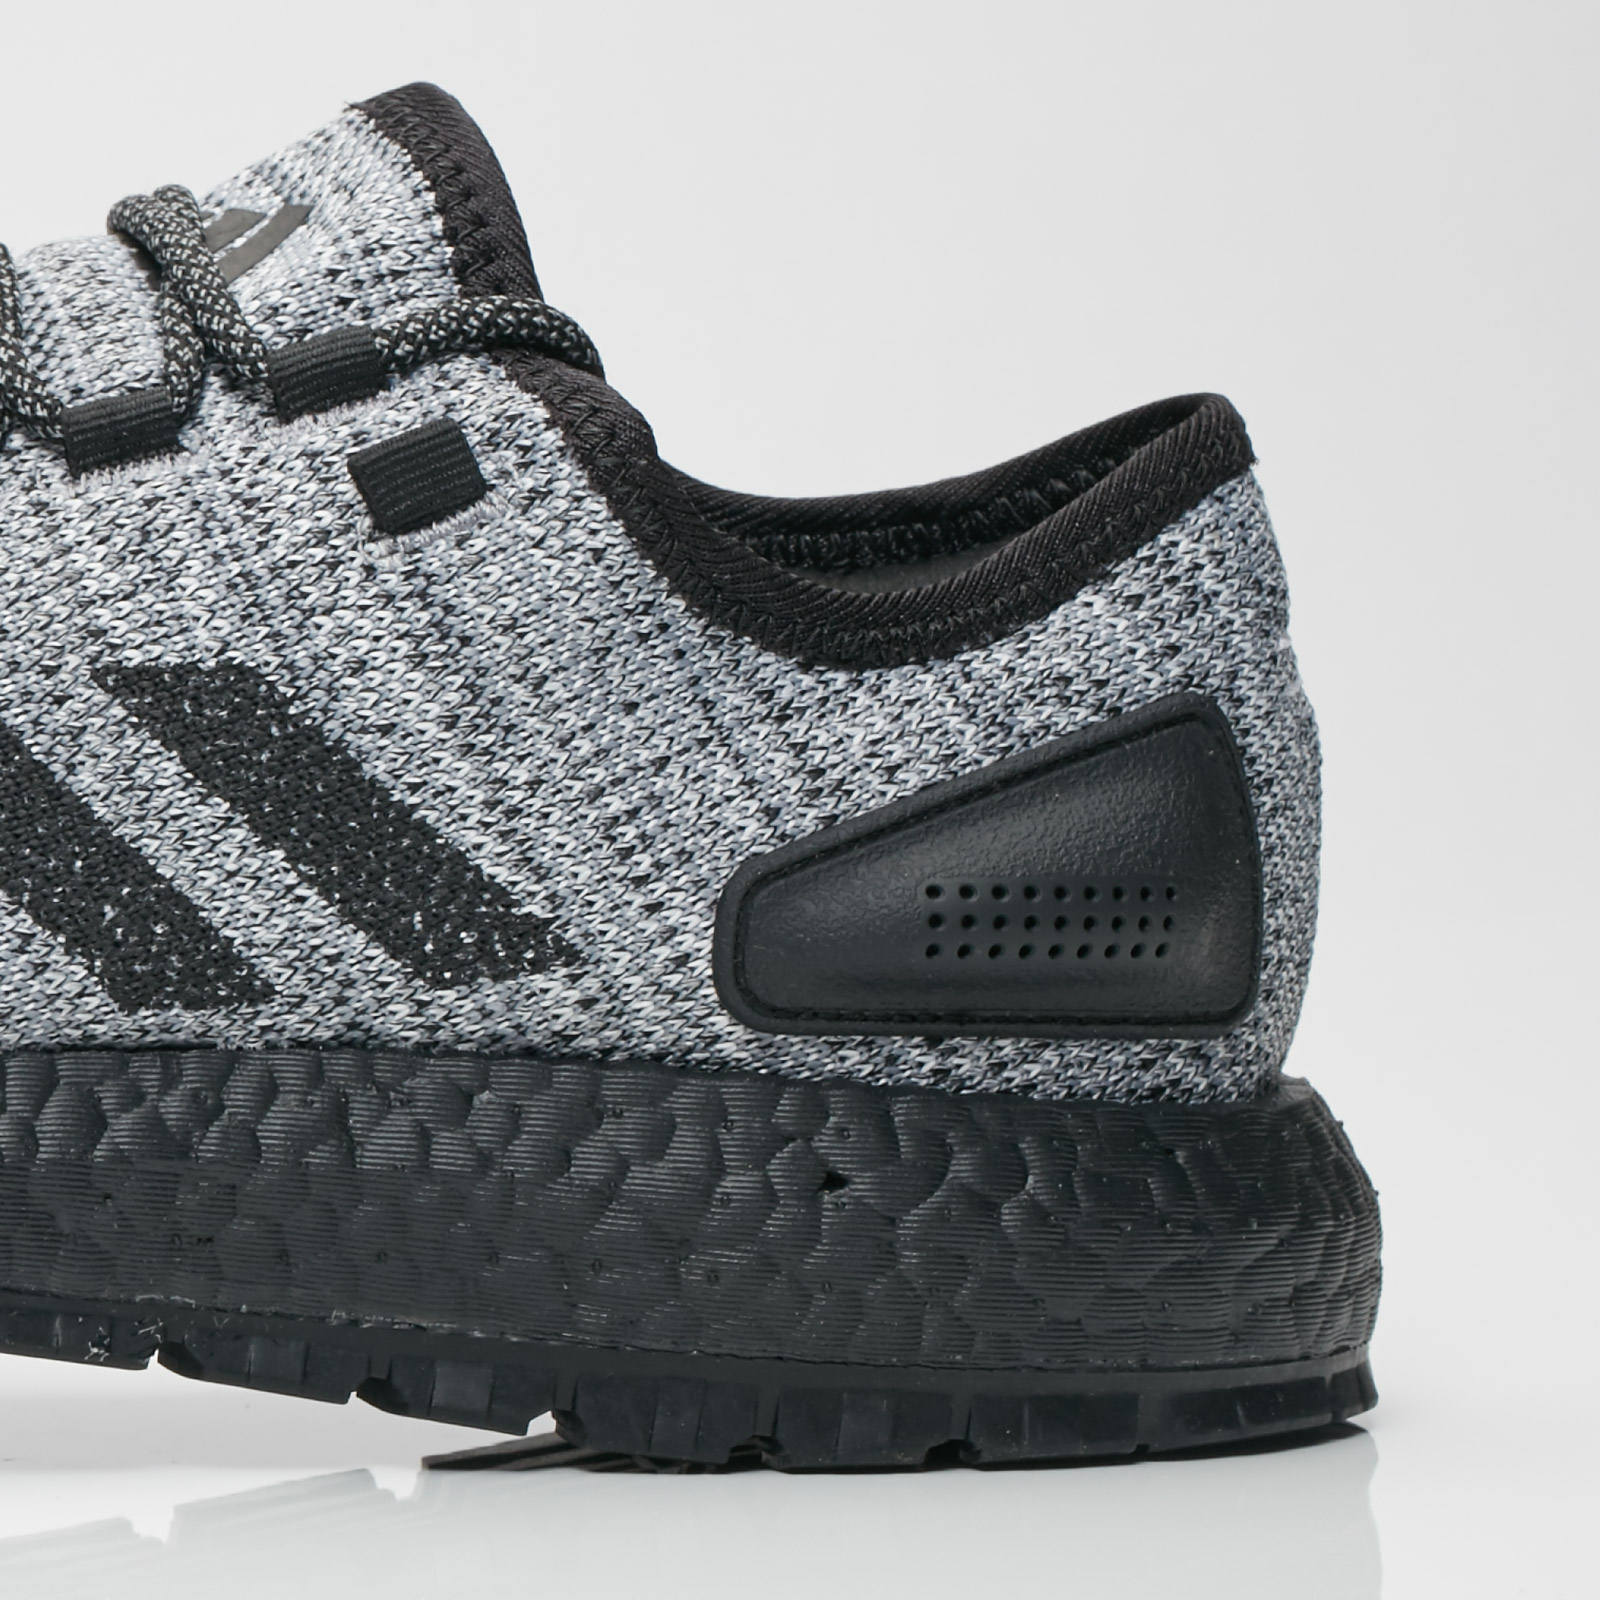 7d7a419ef adidas Pure Boost All Terrain - Cg2989 - Sneakersnstuff